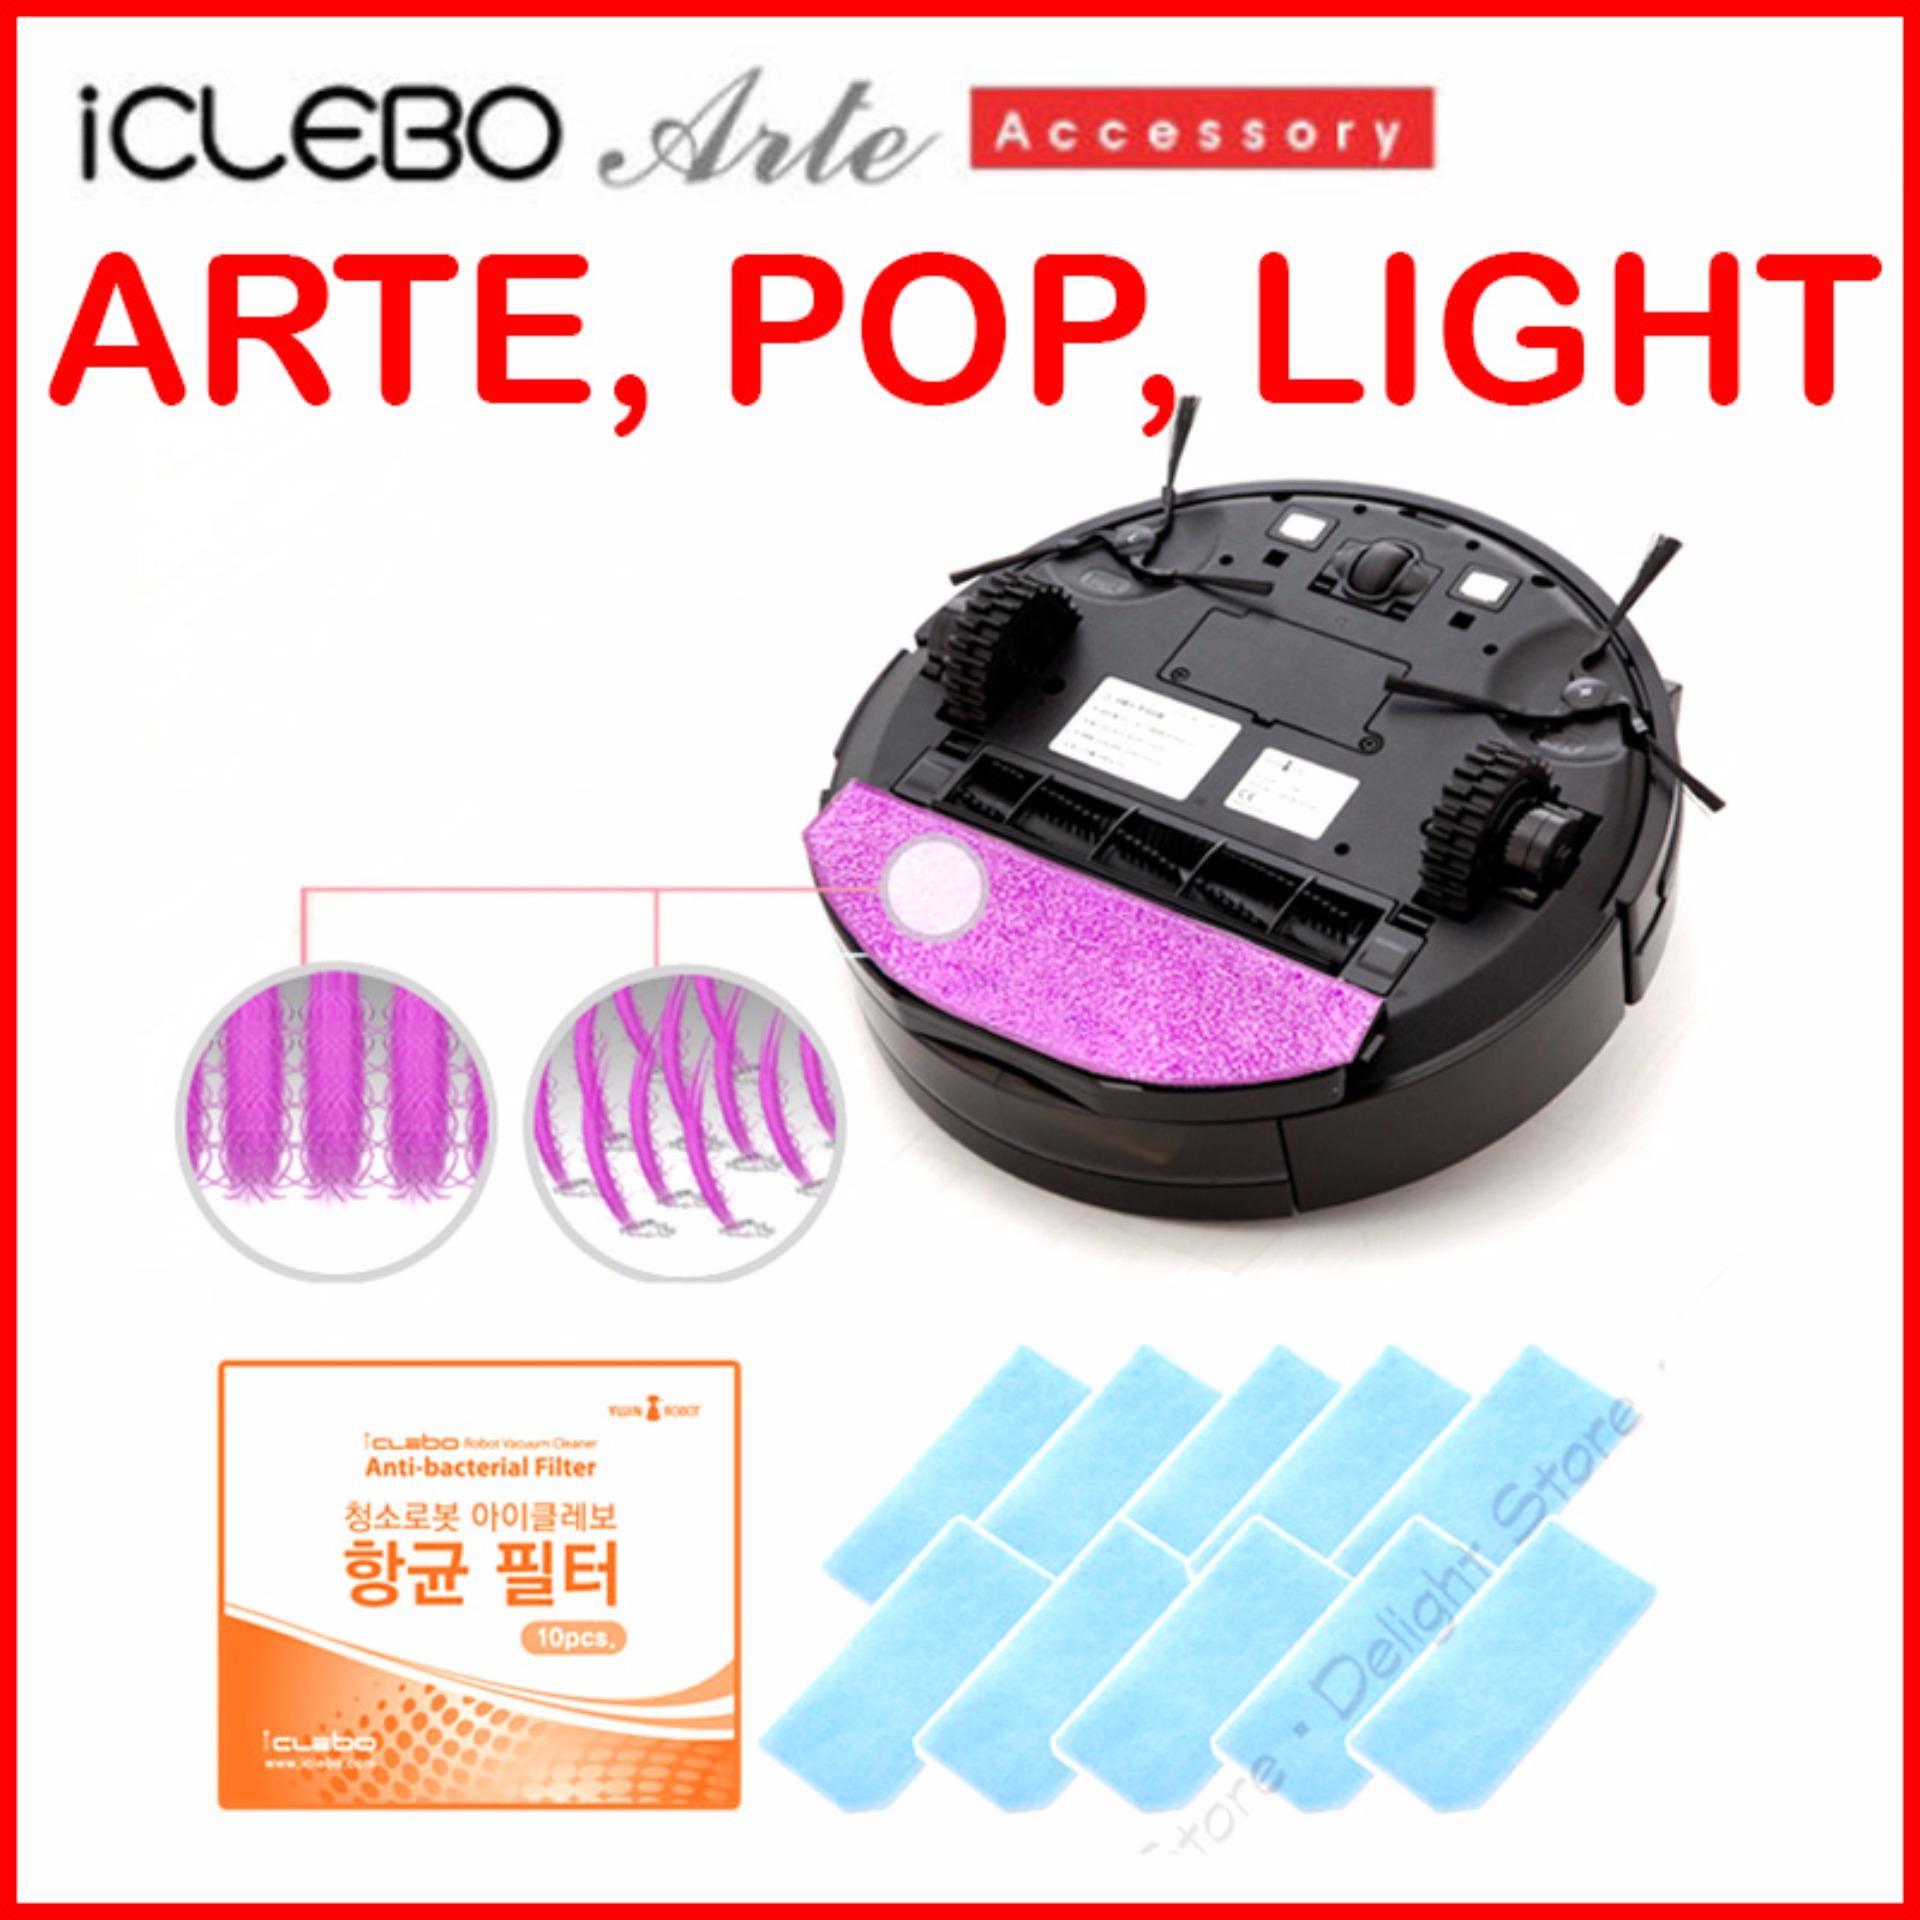 ... YUJIN Korea iClebo Robotic Vacuum Cleaner Replacement for Arte PopLight Model - intl ...